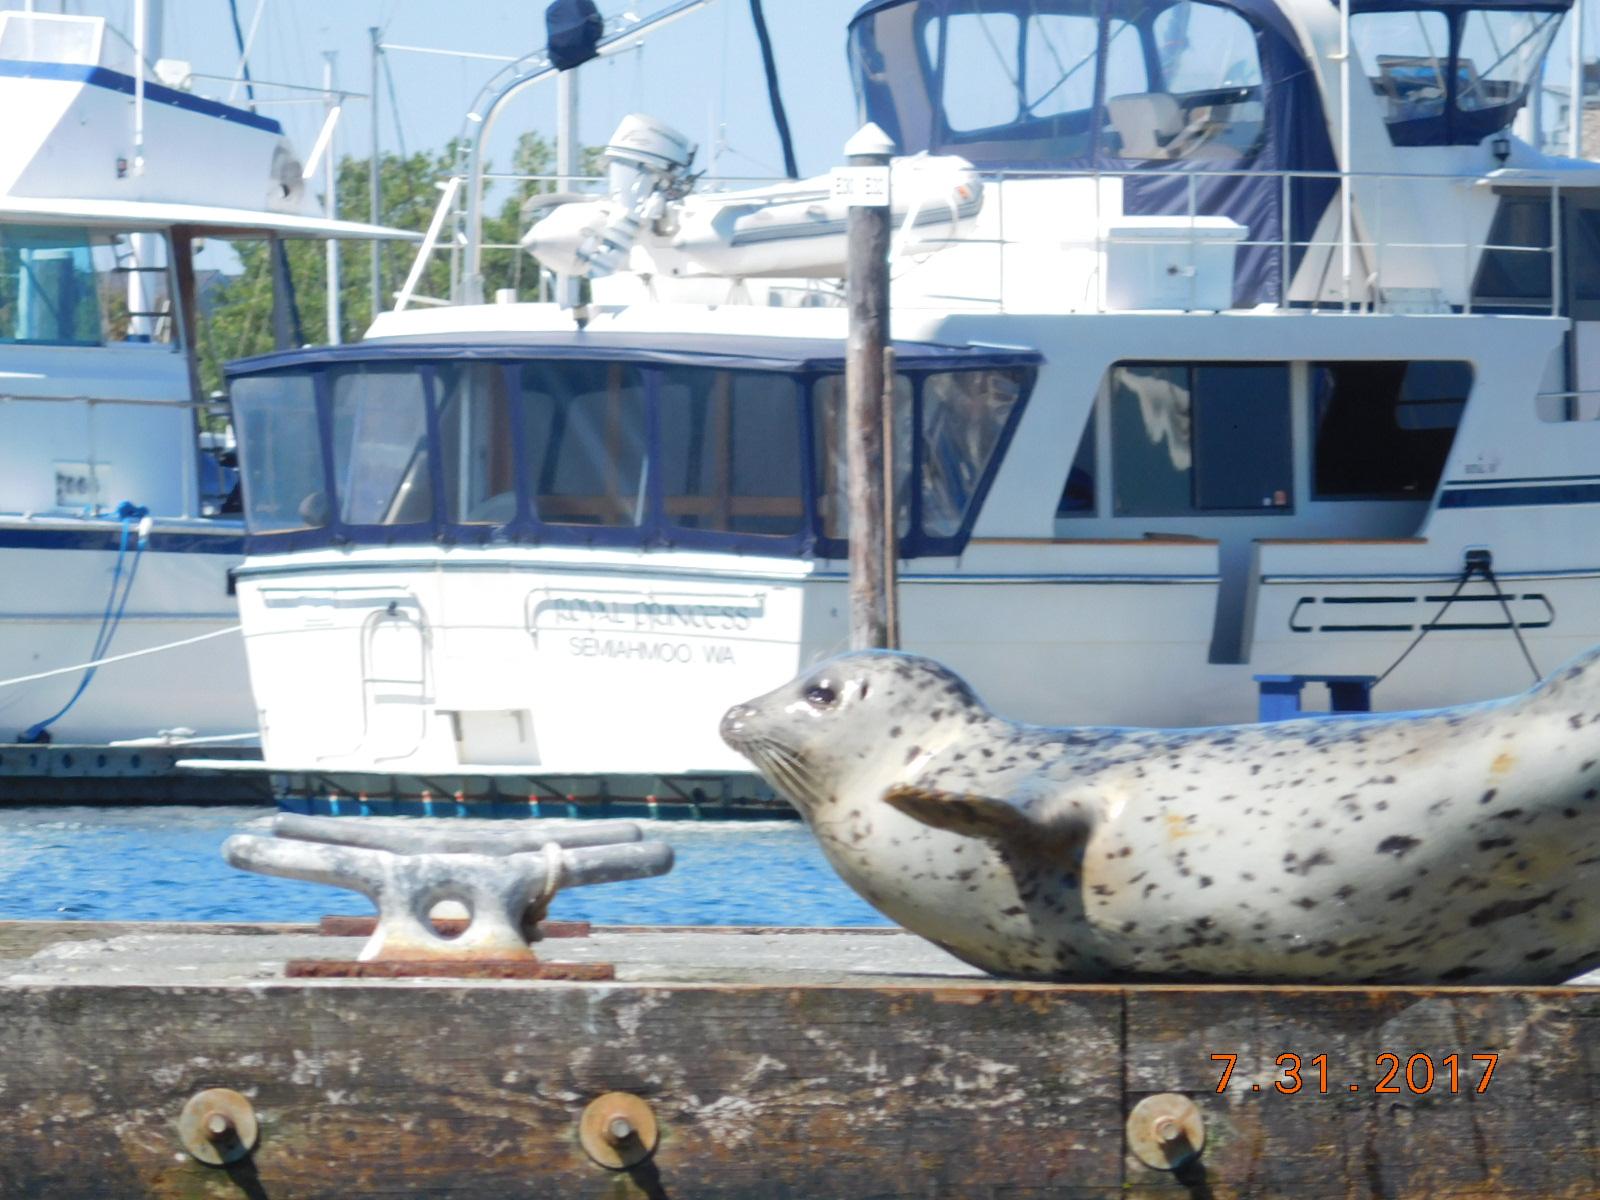 Maritime Len len and gloria s travels august 2017